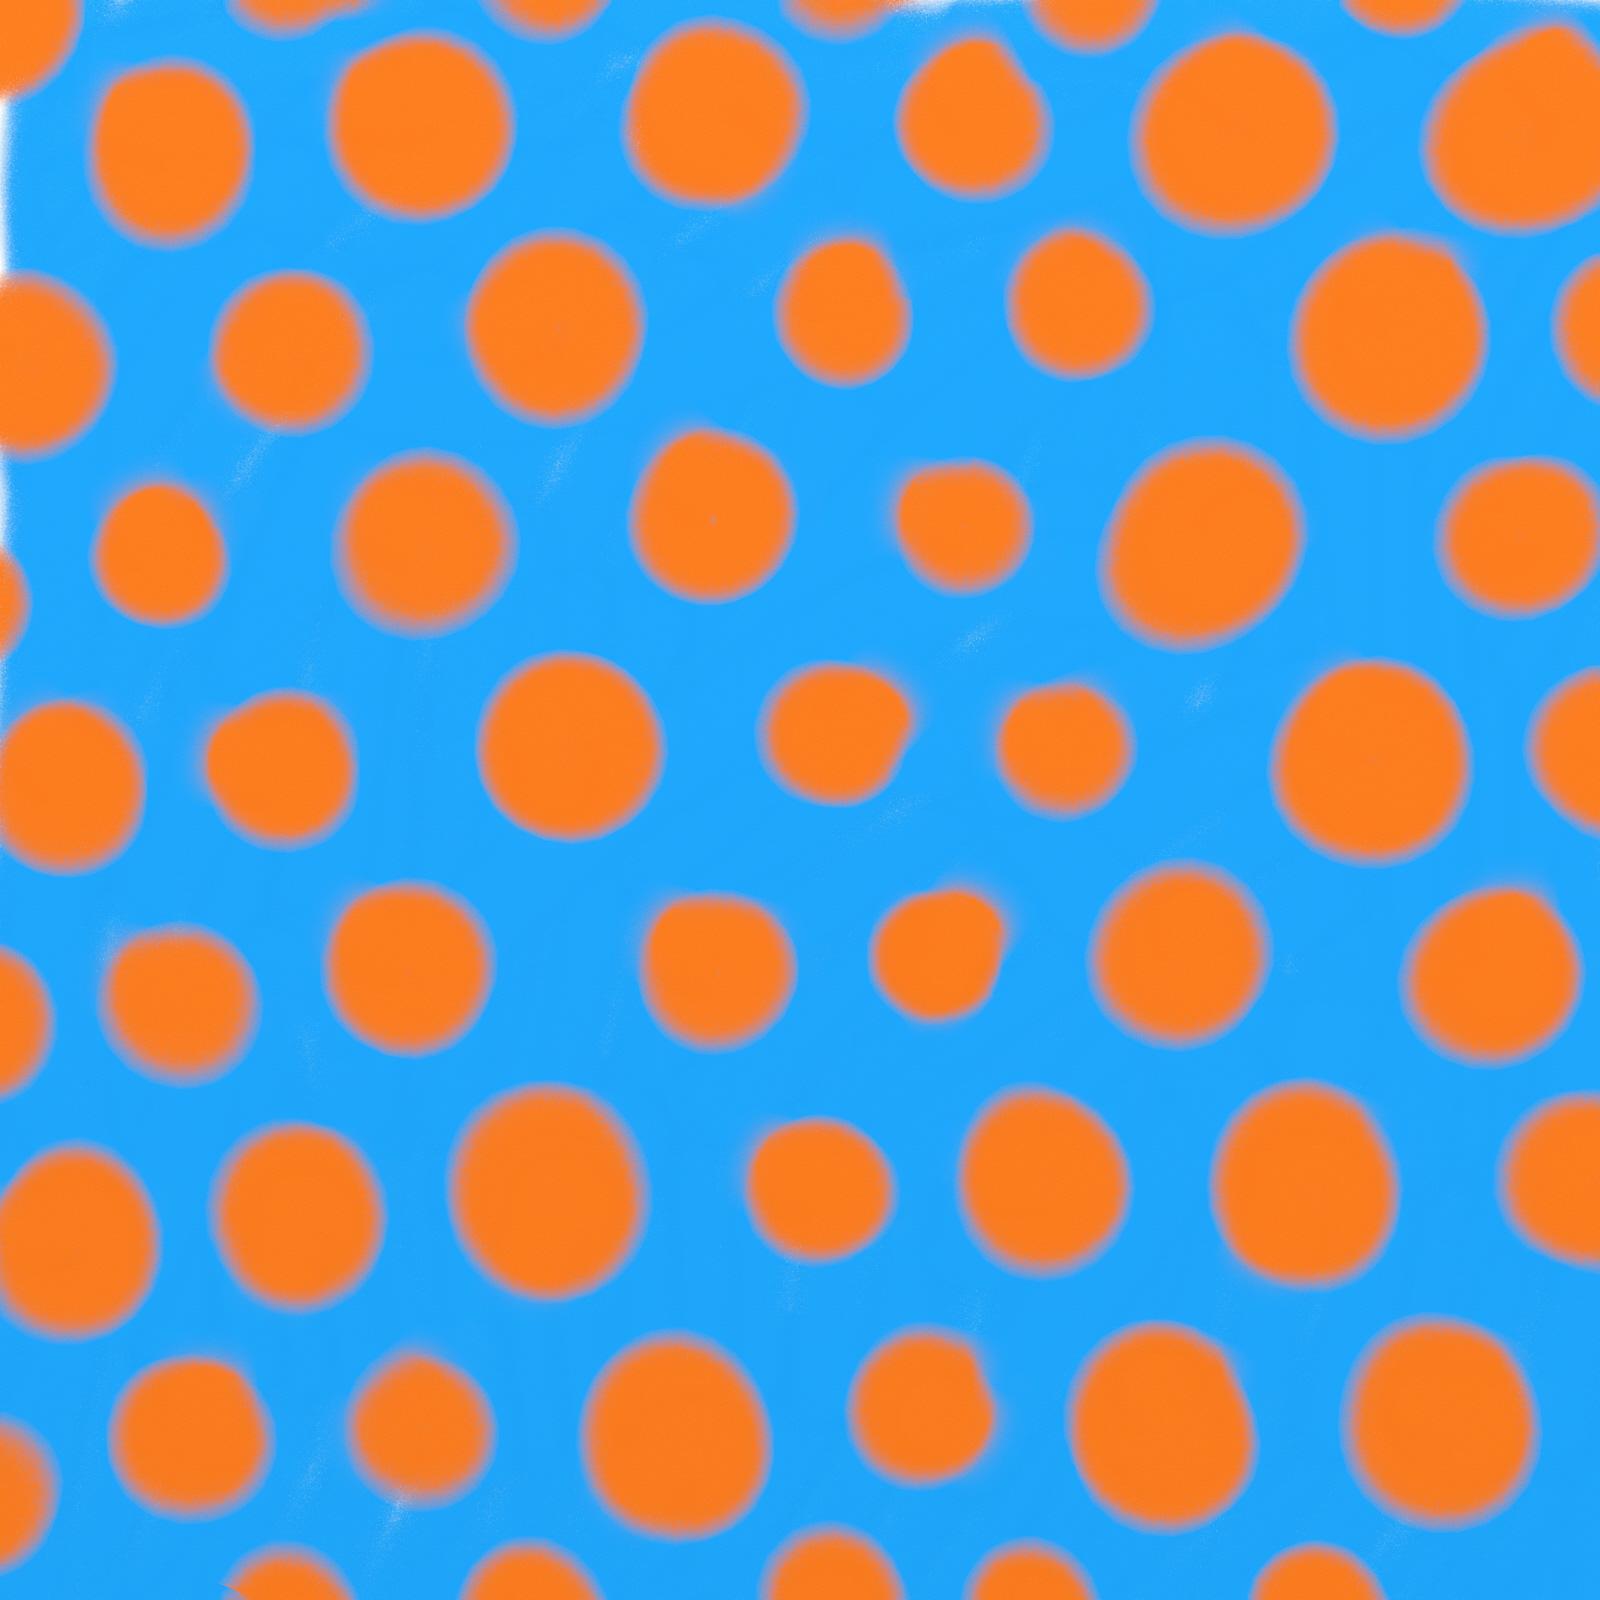 Polka dots photo